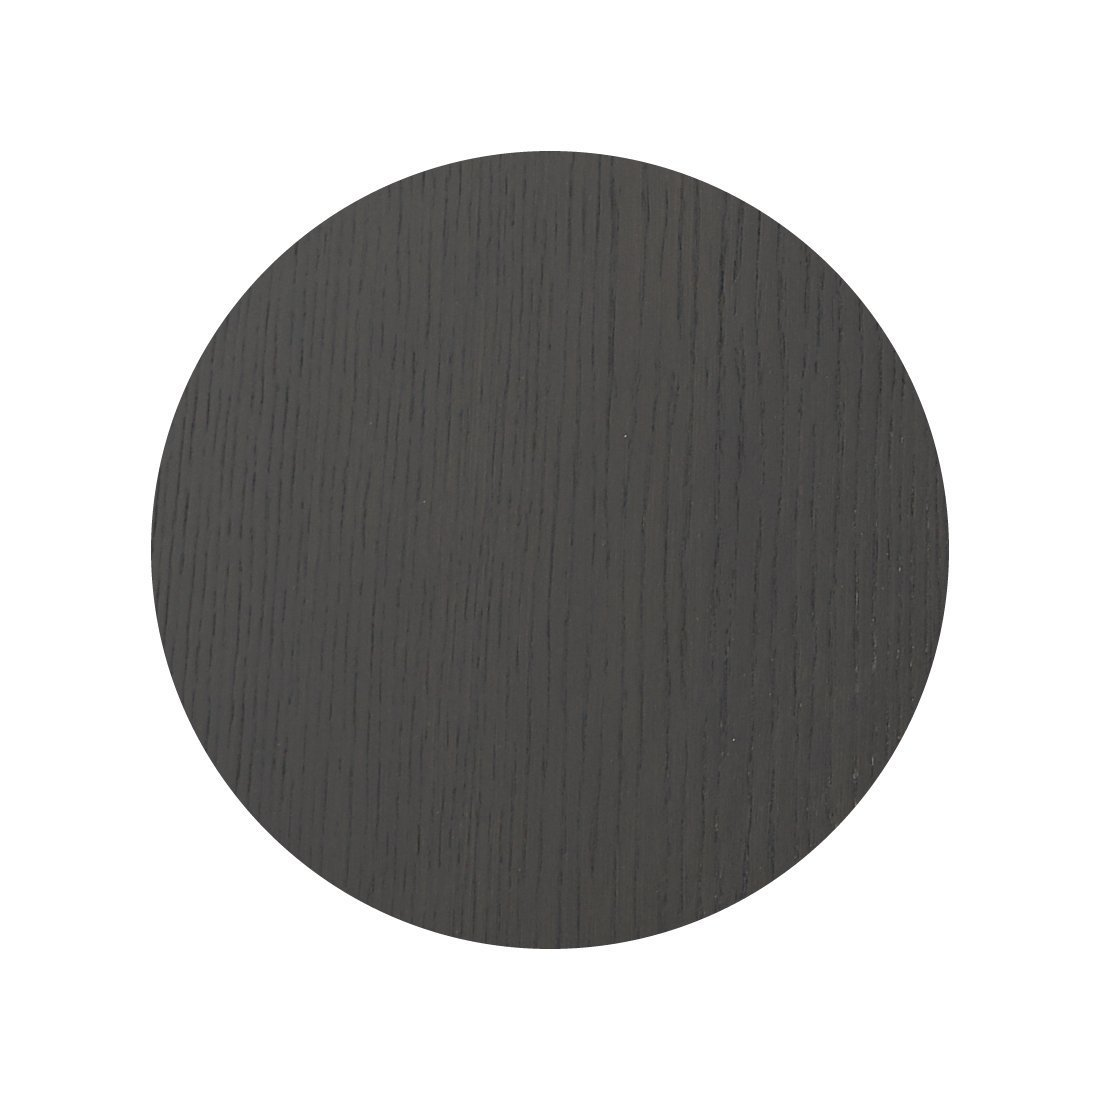 Spectrum Phill Eettafel 210 x 90 cm Antraciet